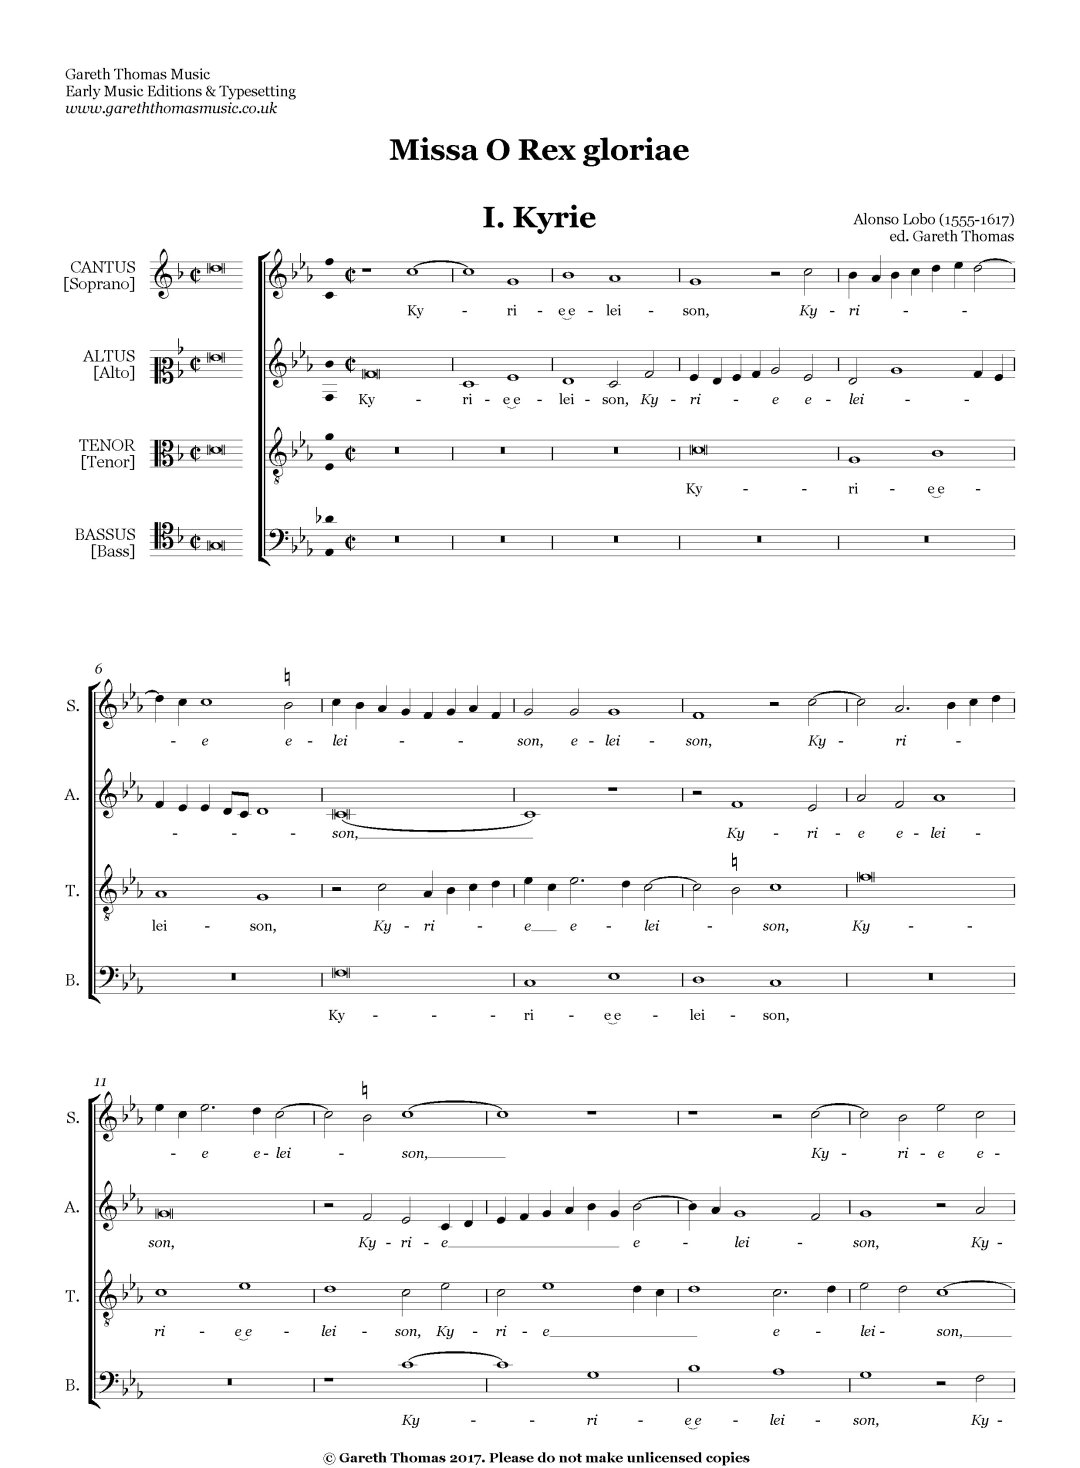 Alonso Lobo Missa O Rex gloria S(S)AT(T)B image